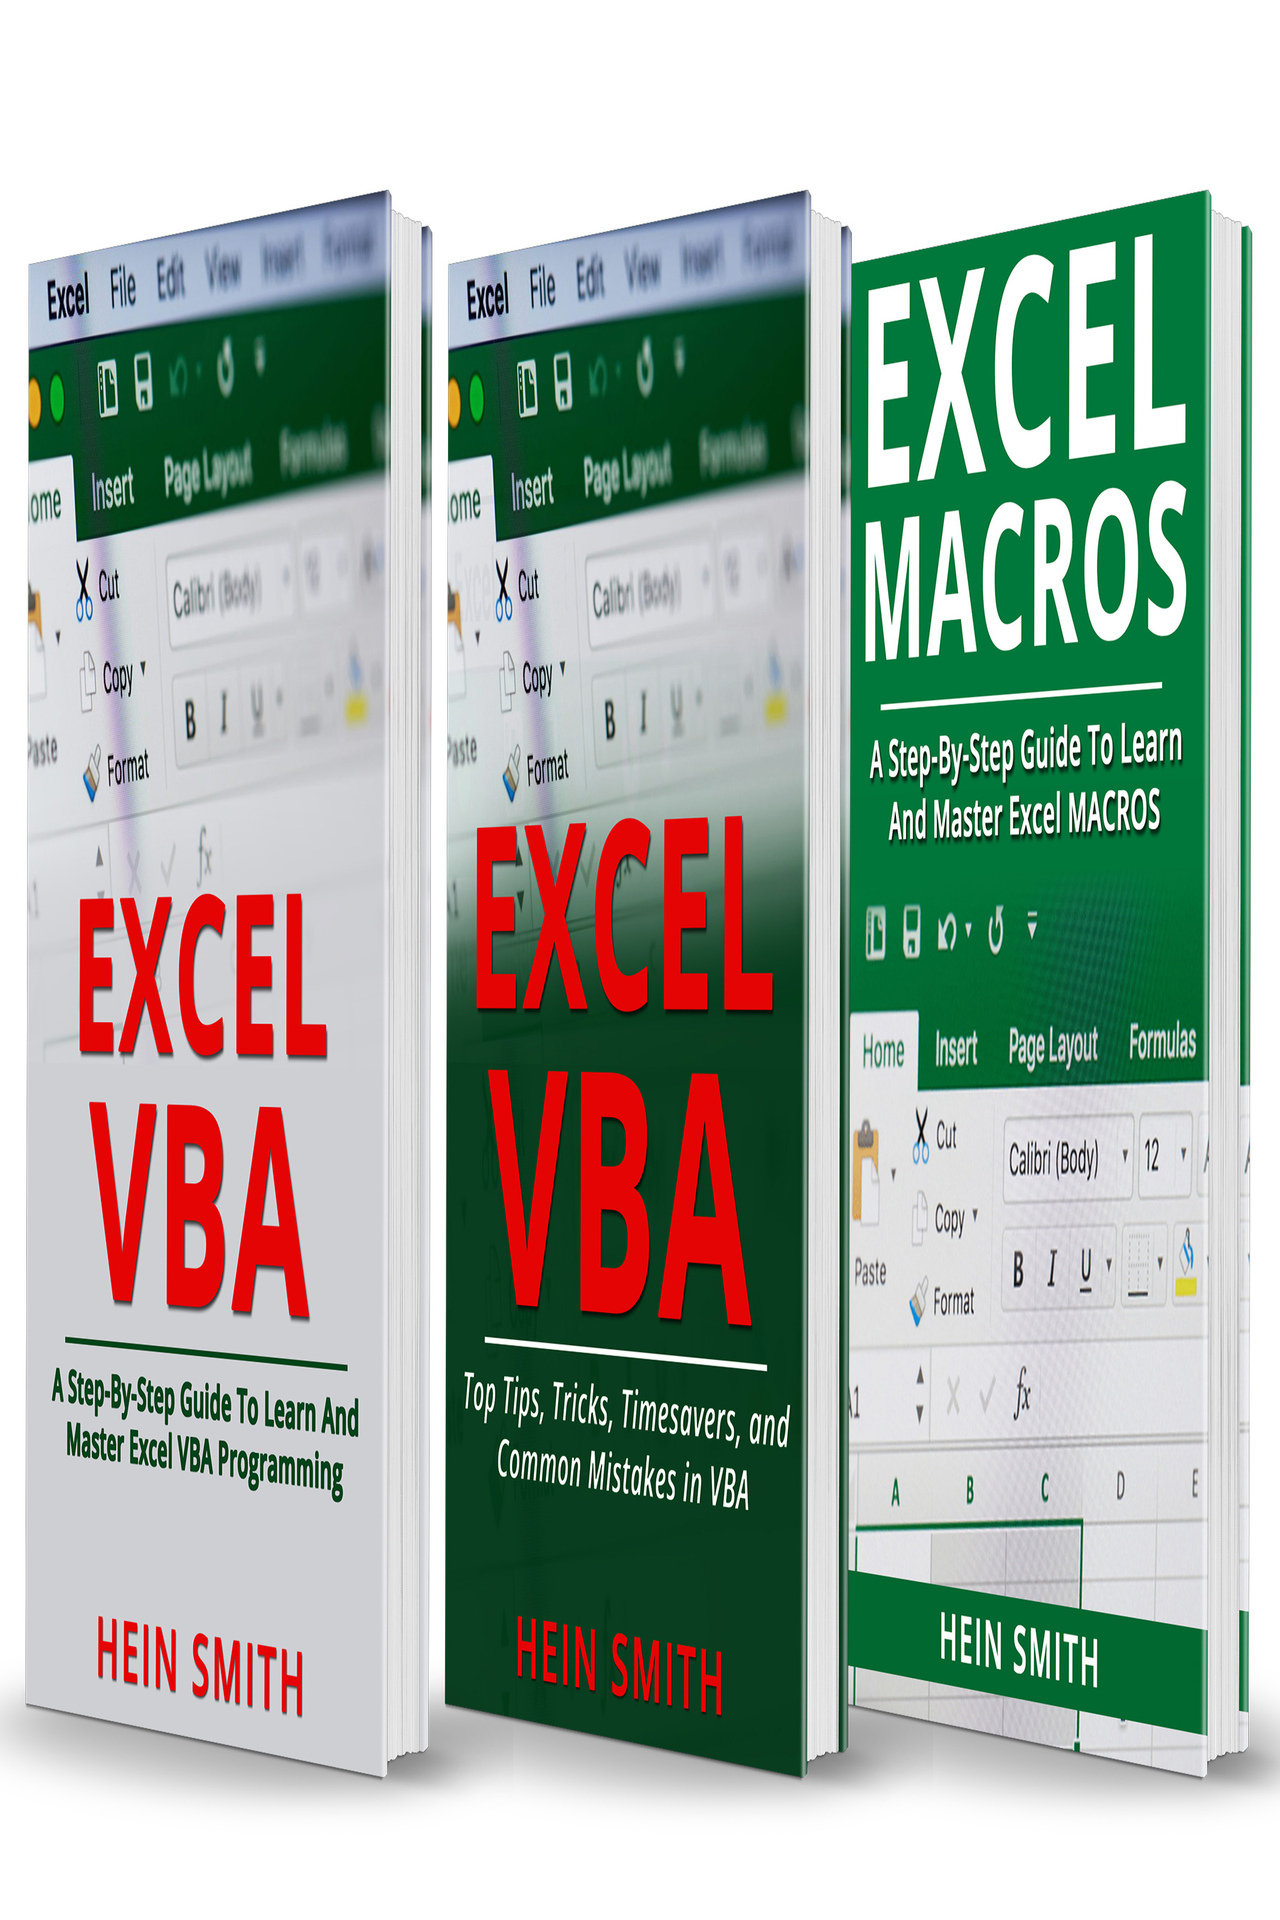 Excel VBA & Excel Macros: Mastering Excel VBA, Tips and Tricks of VBA Programming and Mastering Excel Macros-P2P